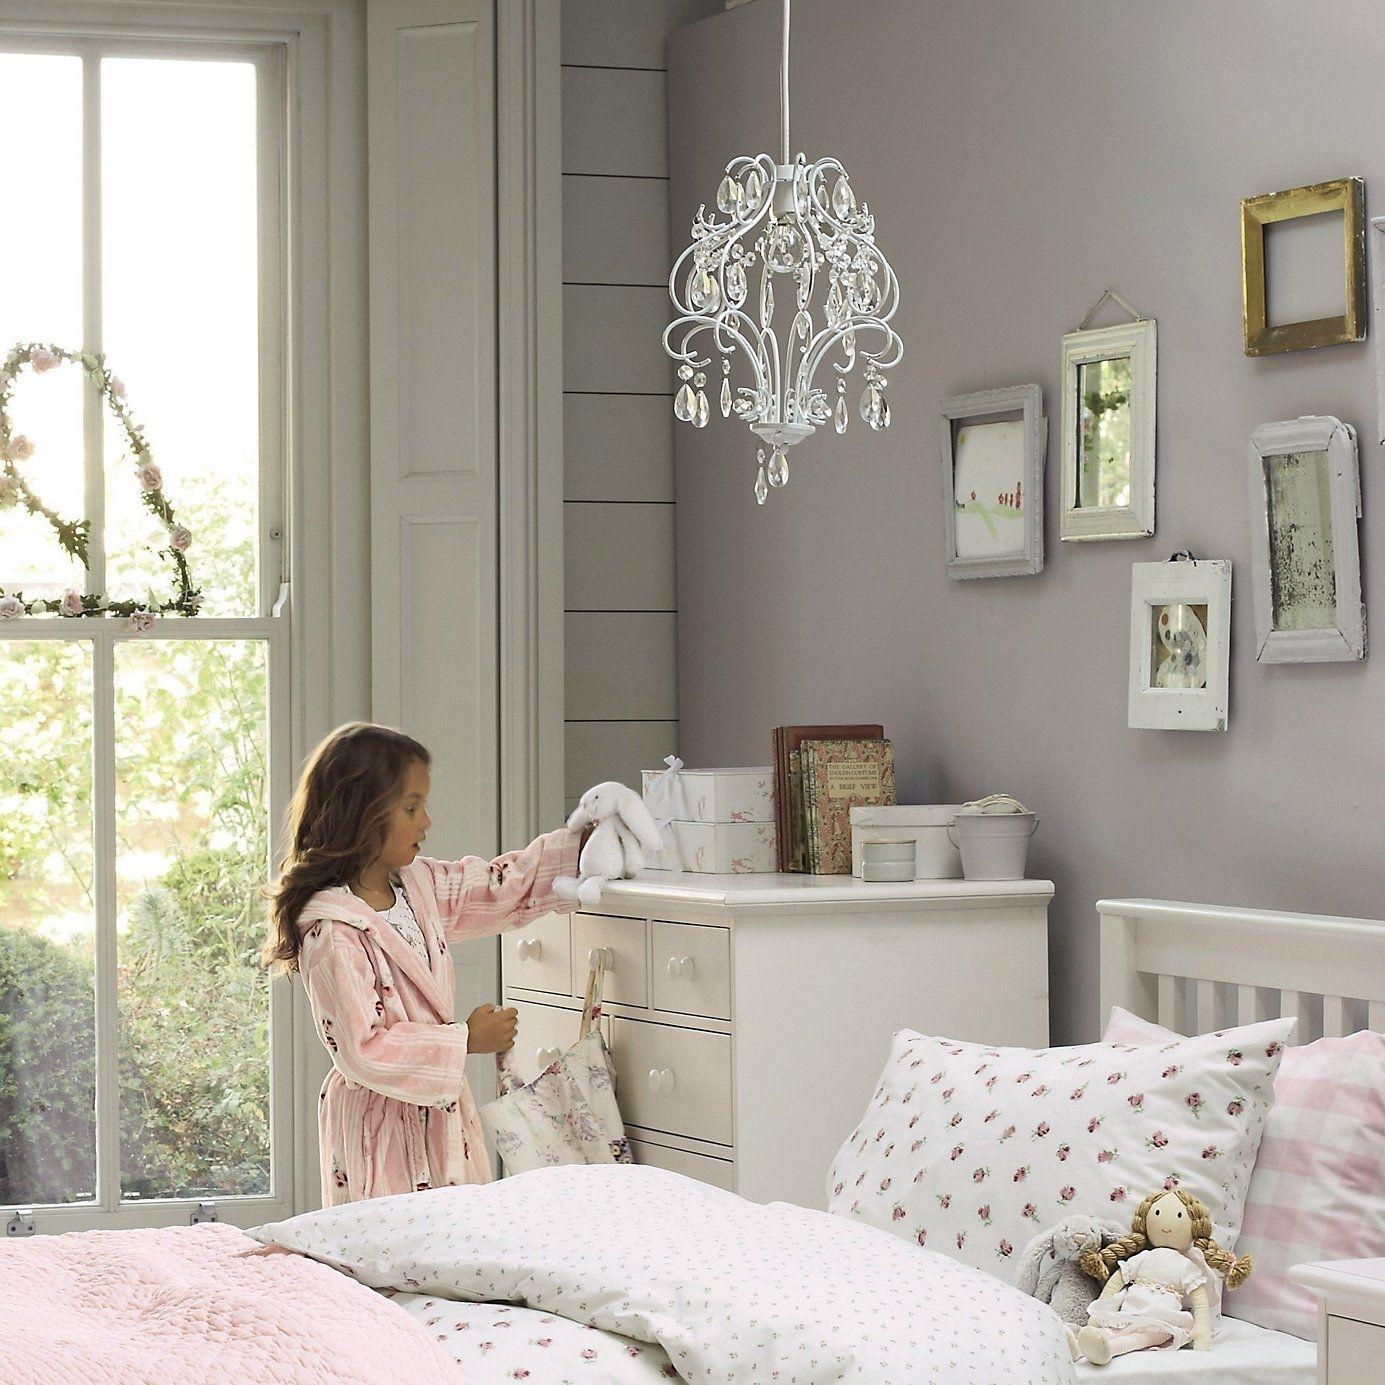 20 Bedroom Chandelier Designs Decorating Ideas: 10 Perfect Chandeliers For Girls Bedrooms Ideas For Your